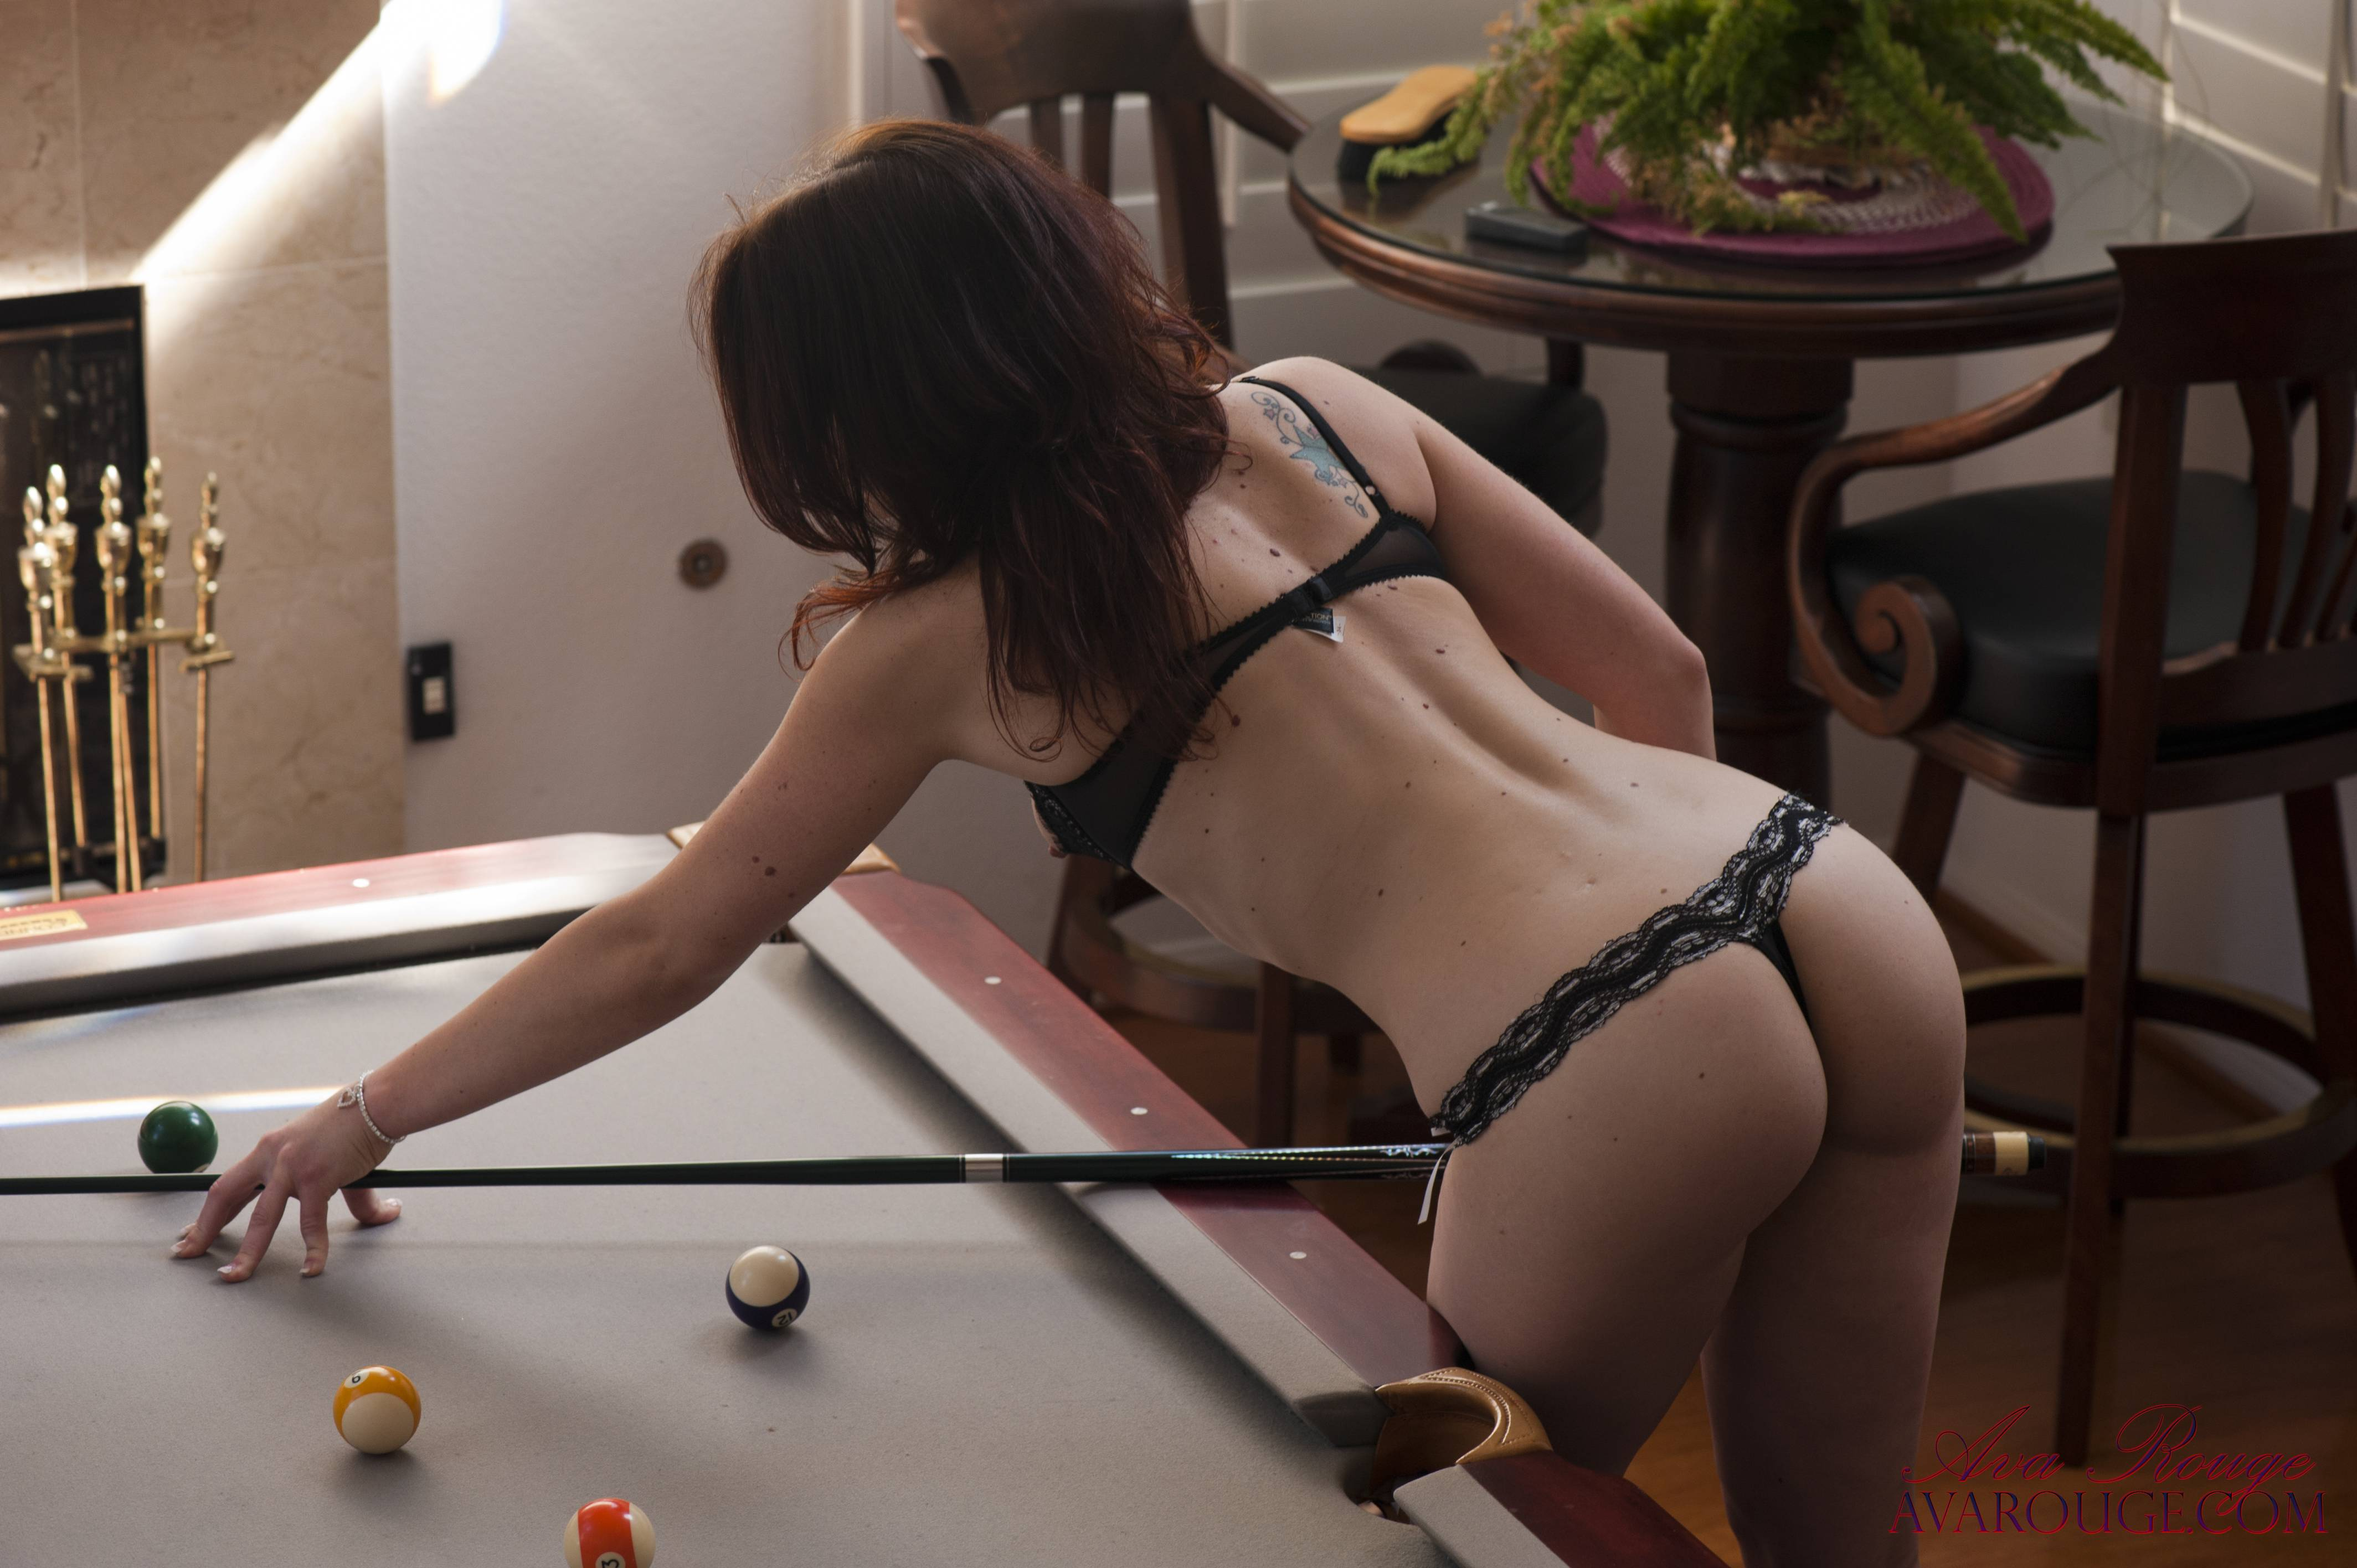 Red head sex underwear pool